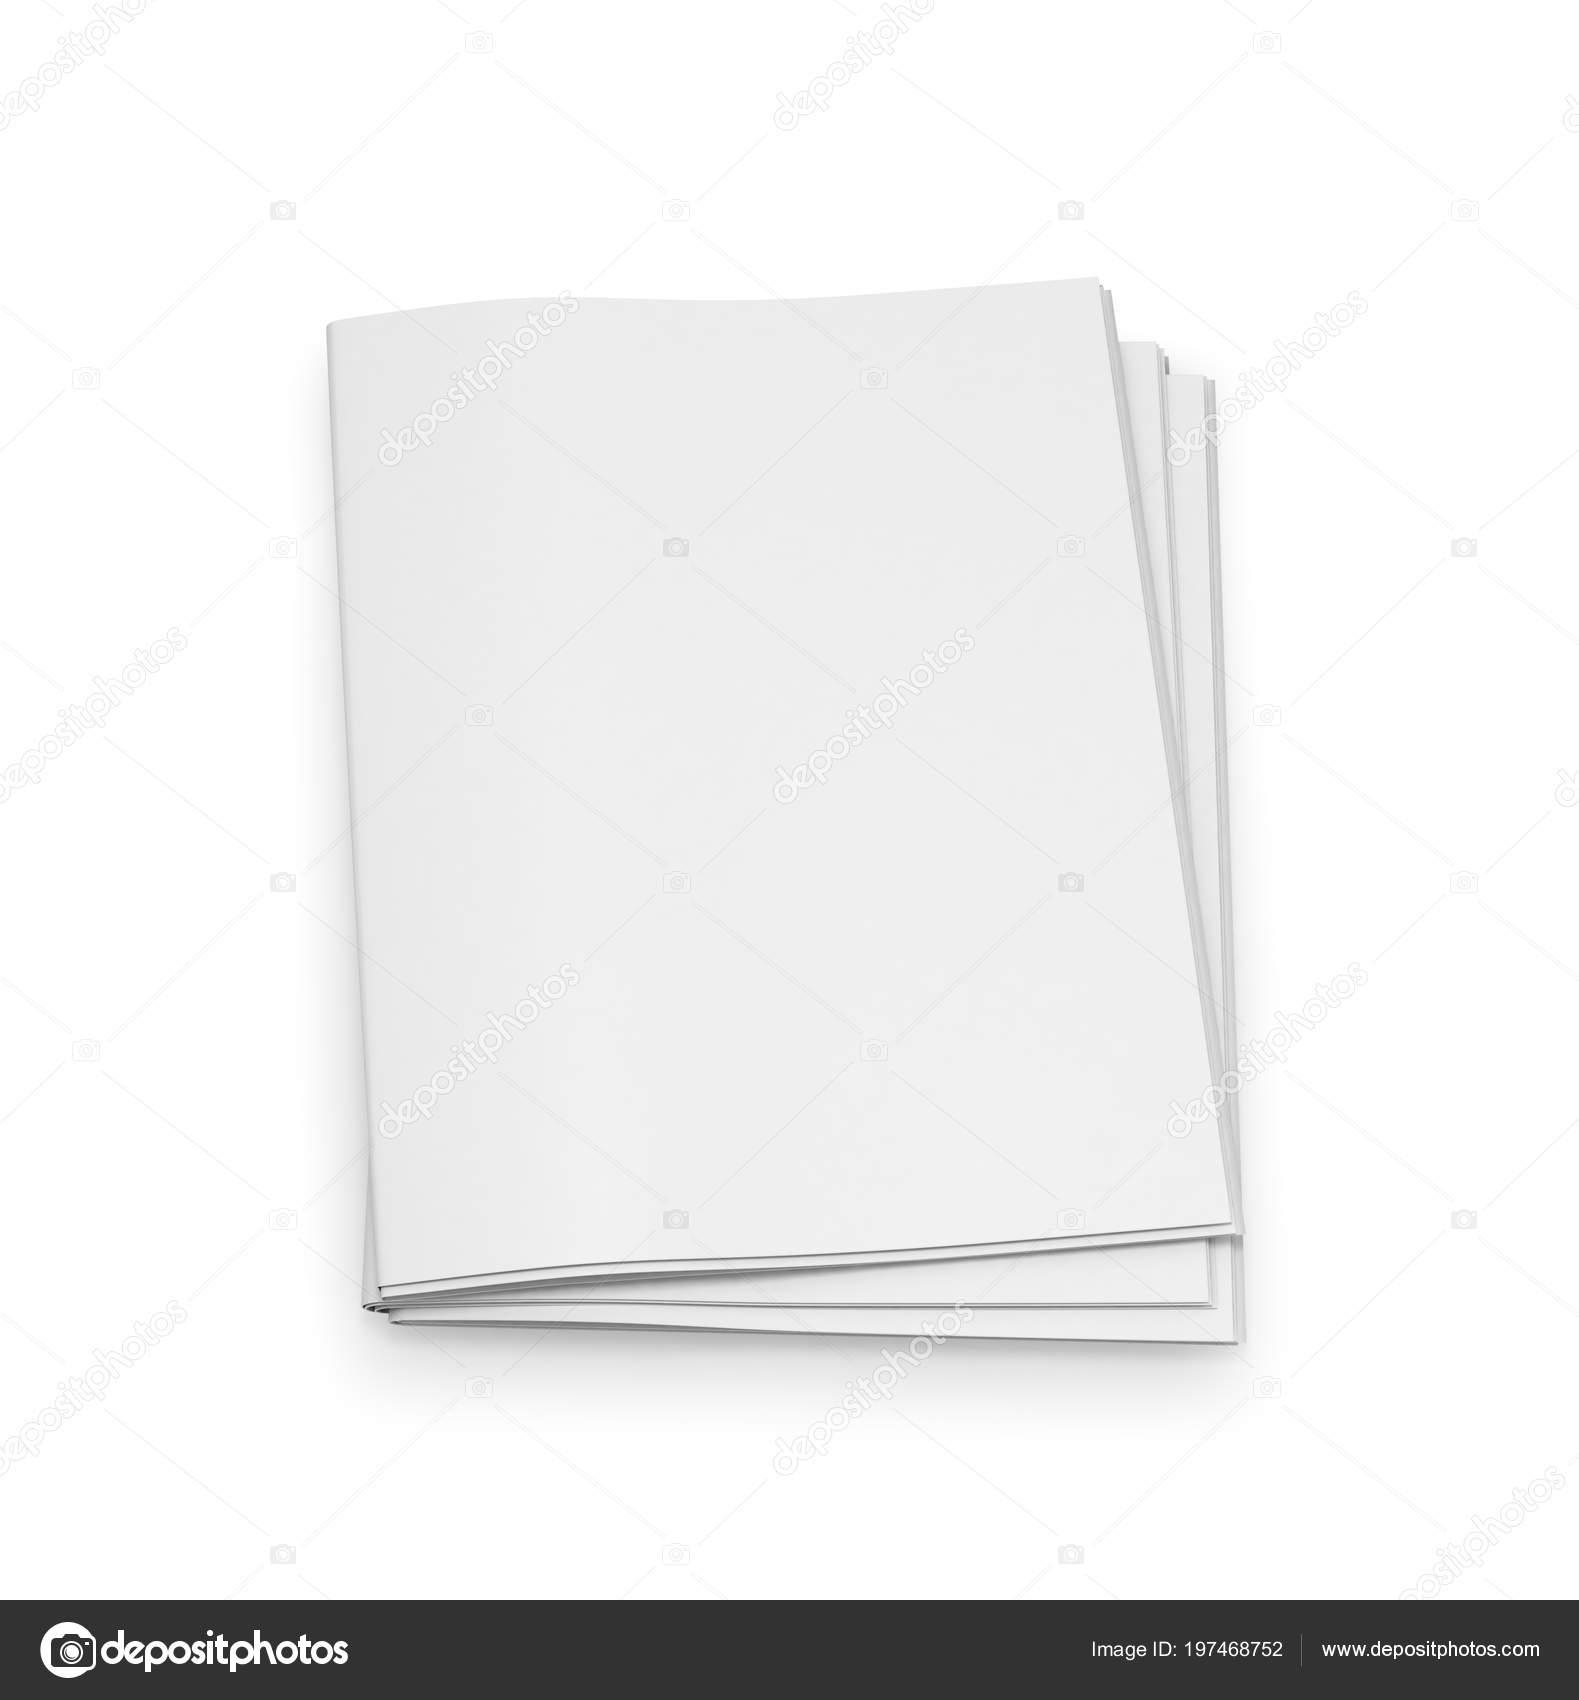 Empty Newspaper Template White Background Illustration Stock Photo